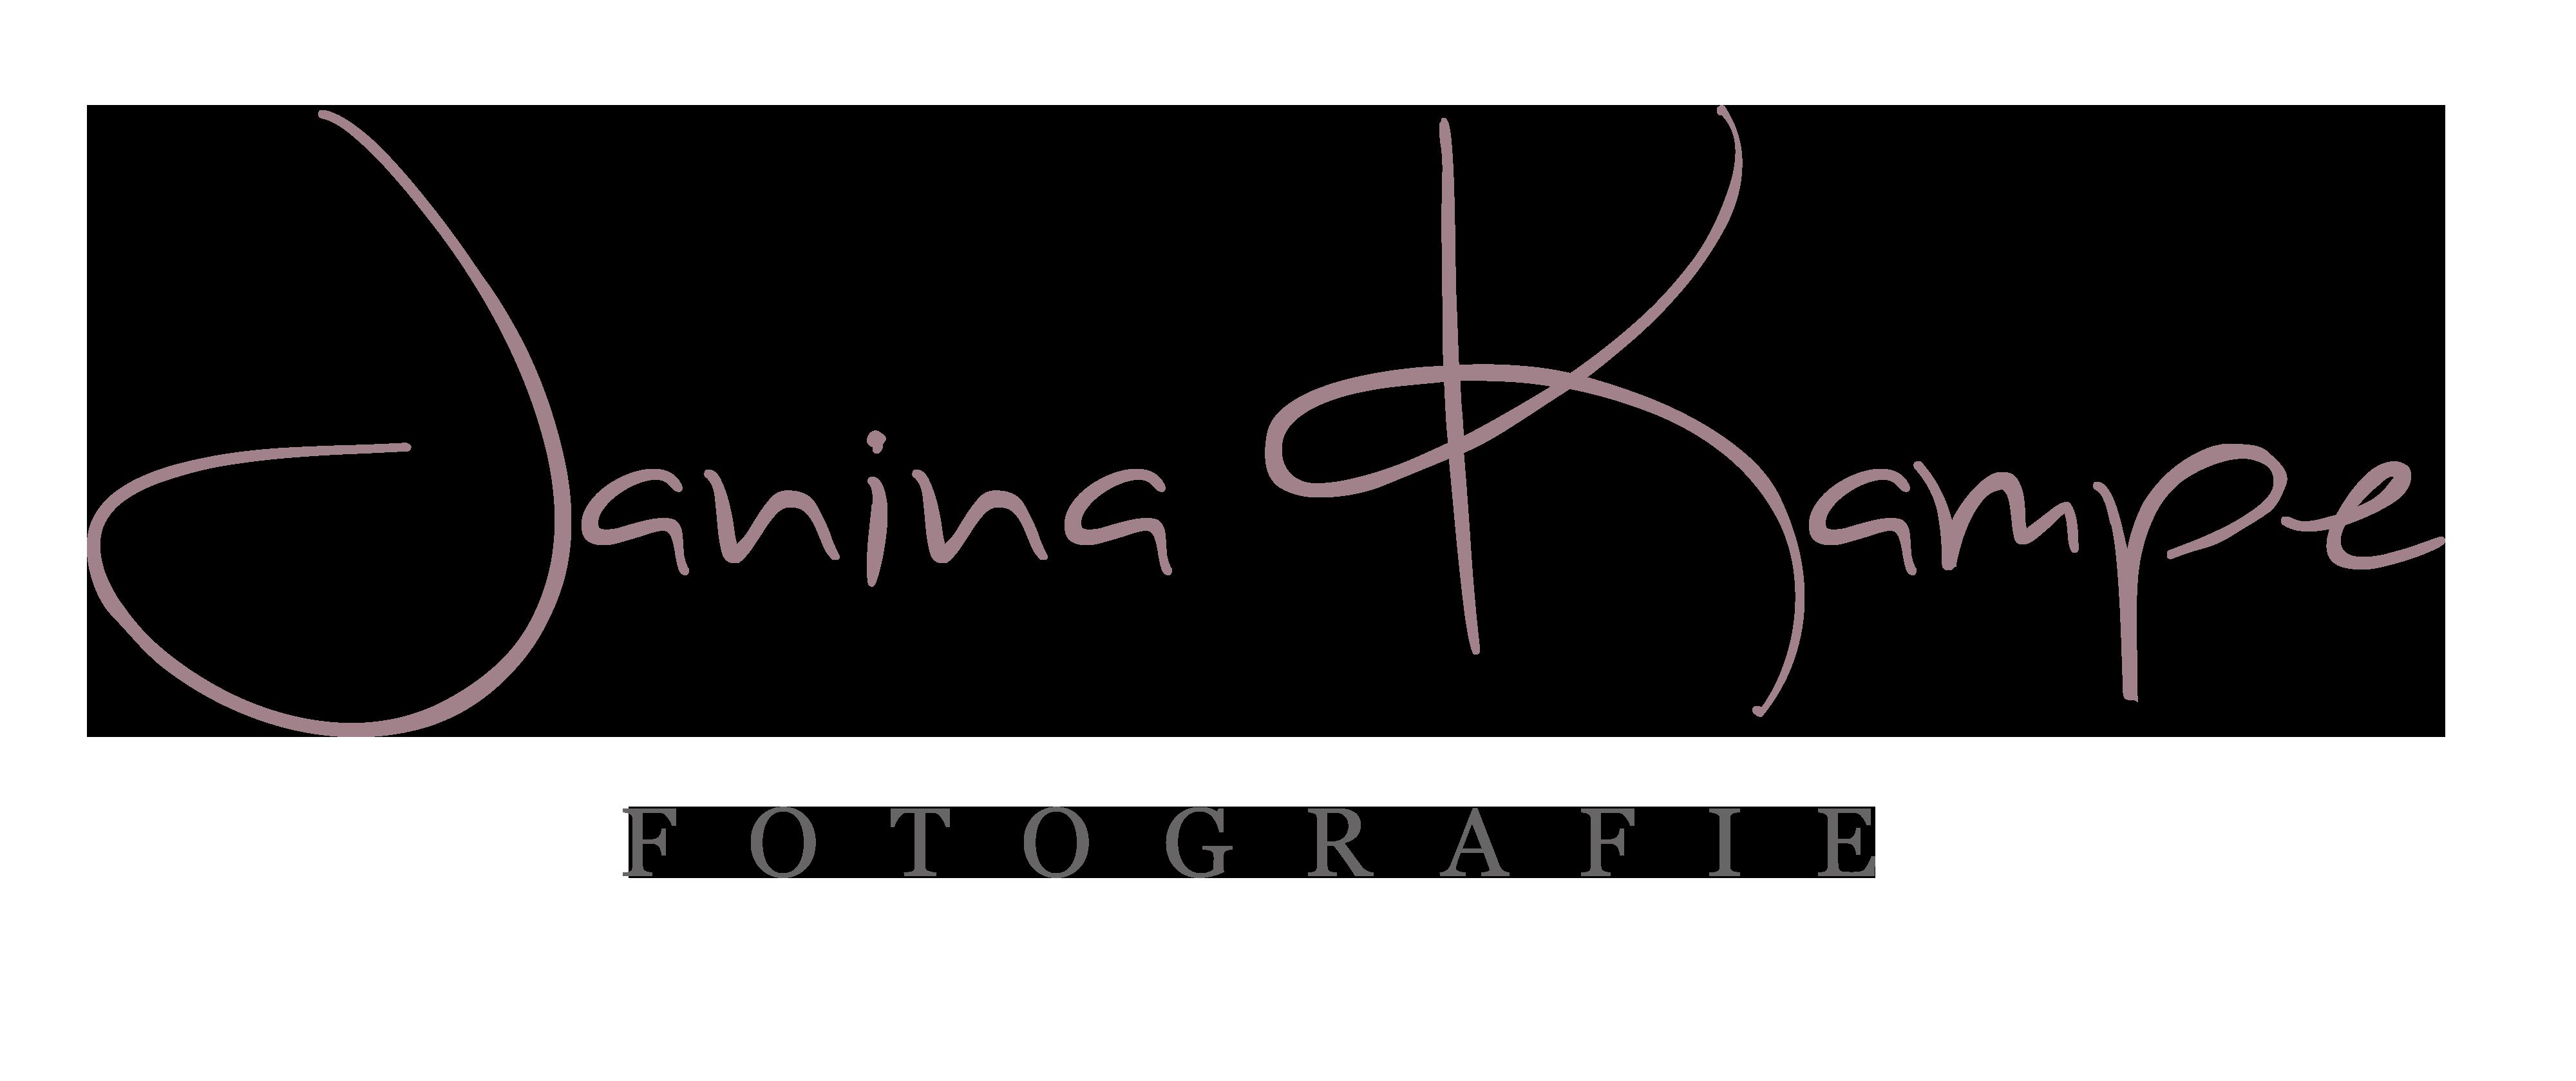 Janina Kampe Fotografie